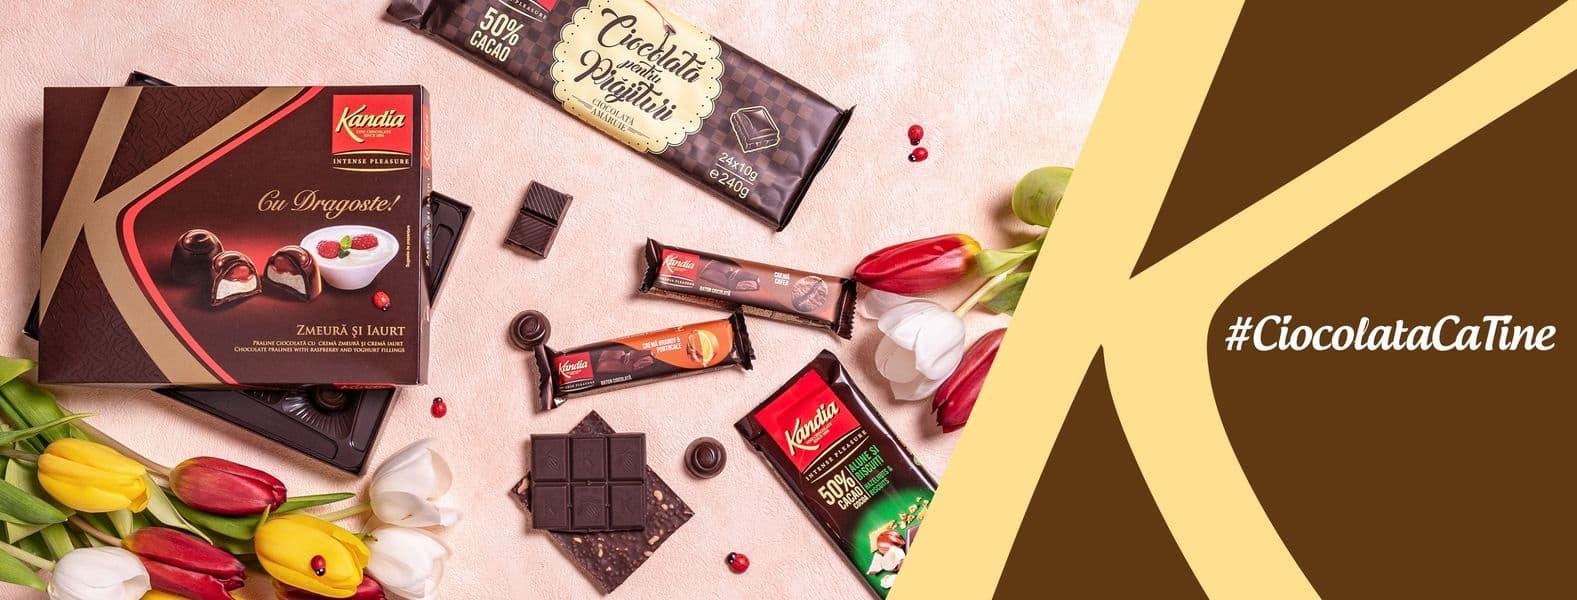 Trade-marketing si merchandising in distributia de dulciuri